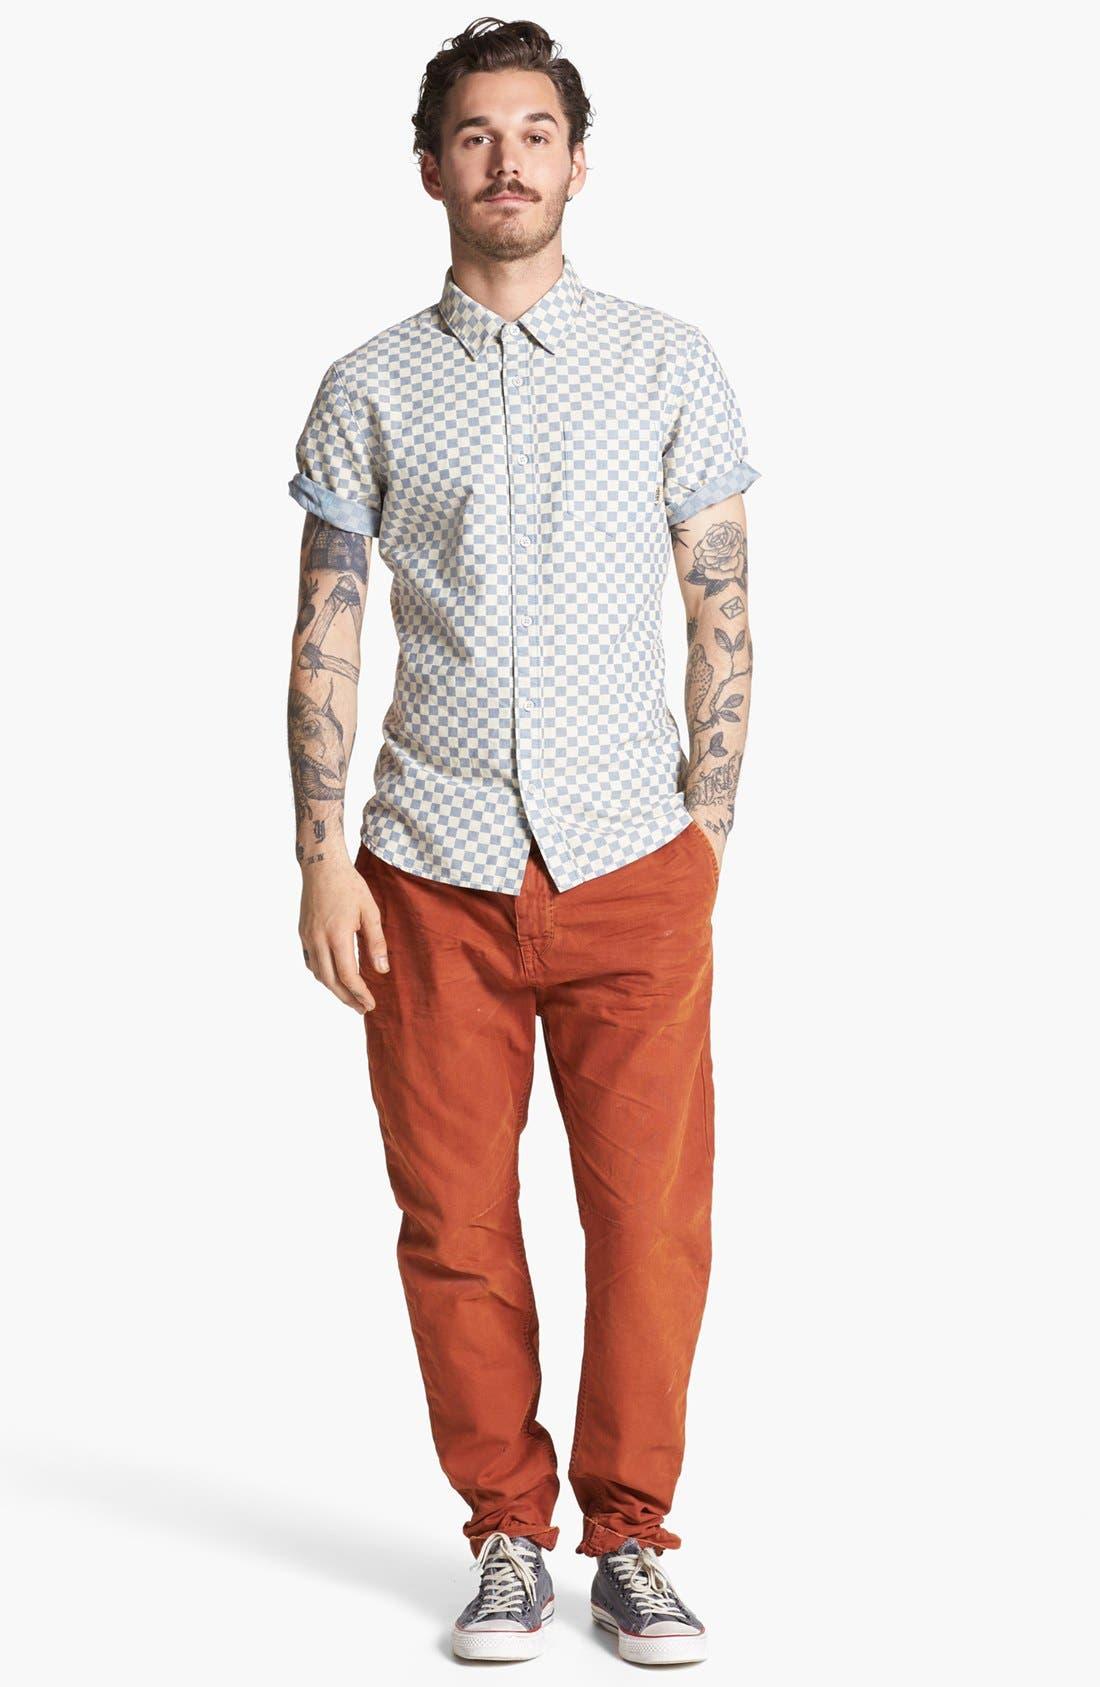 Main Image - Vans Shirt & Scotch & Soda Slim Tapered Leg Chinos